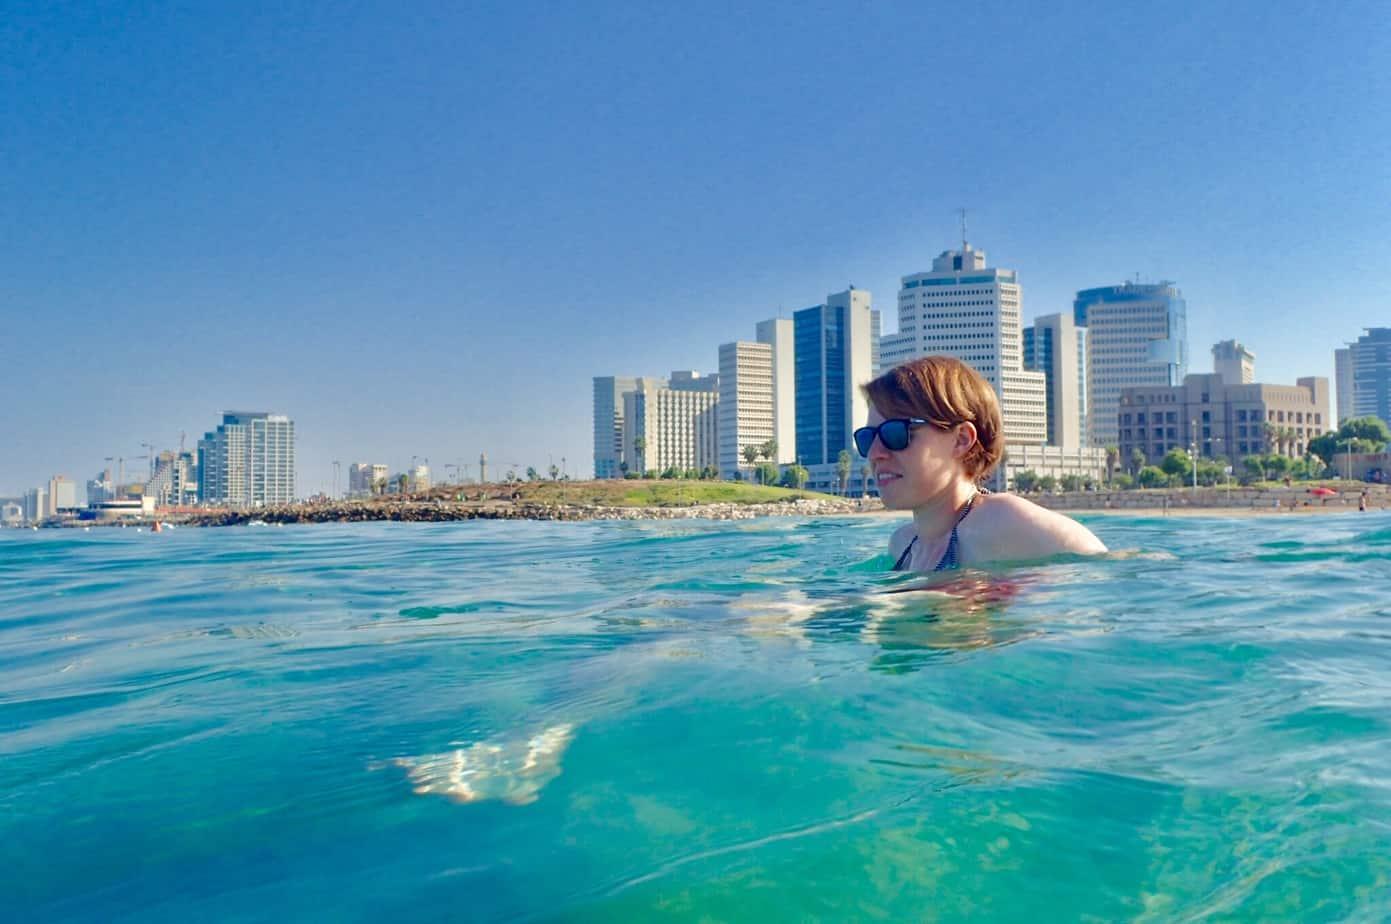 Me swimming in Tel Aviv banana beach